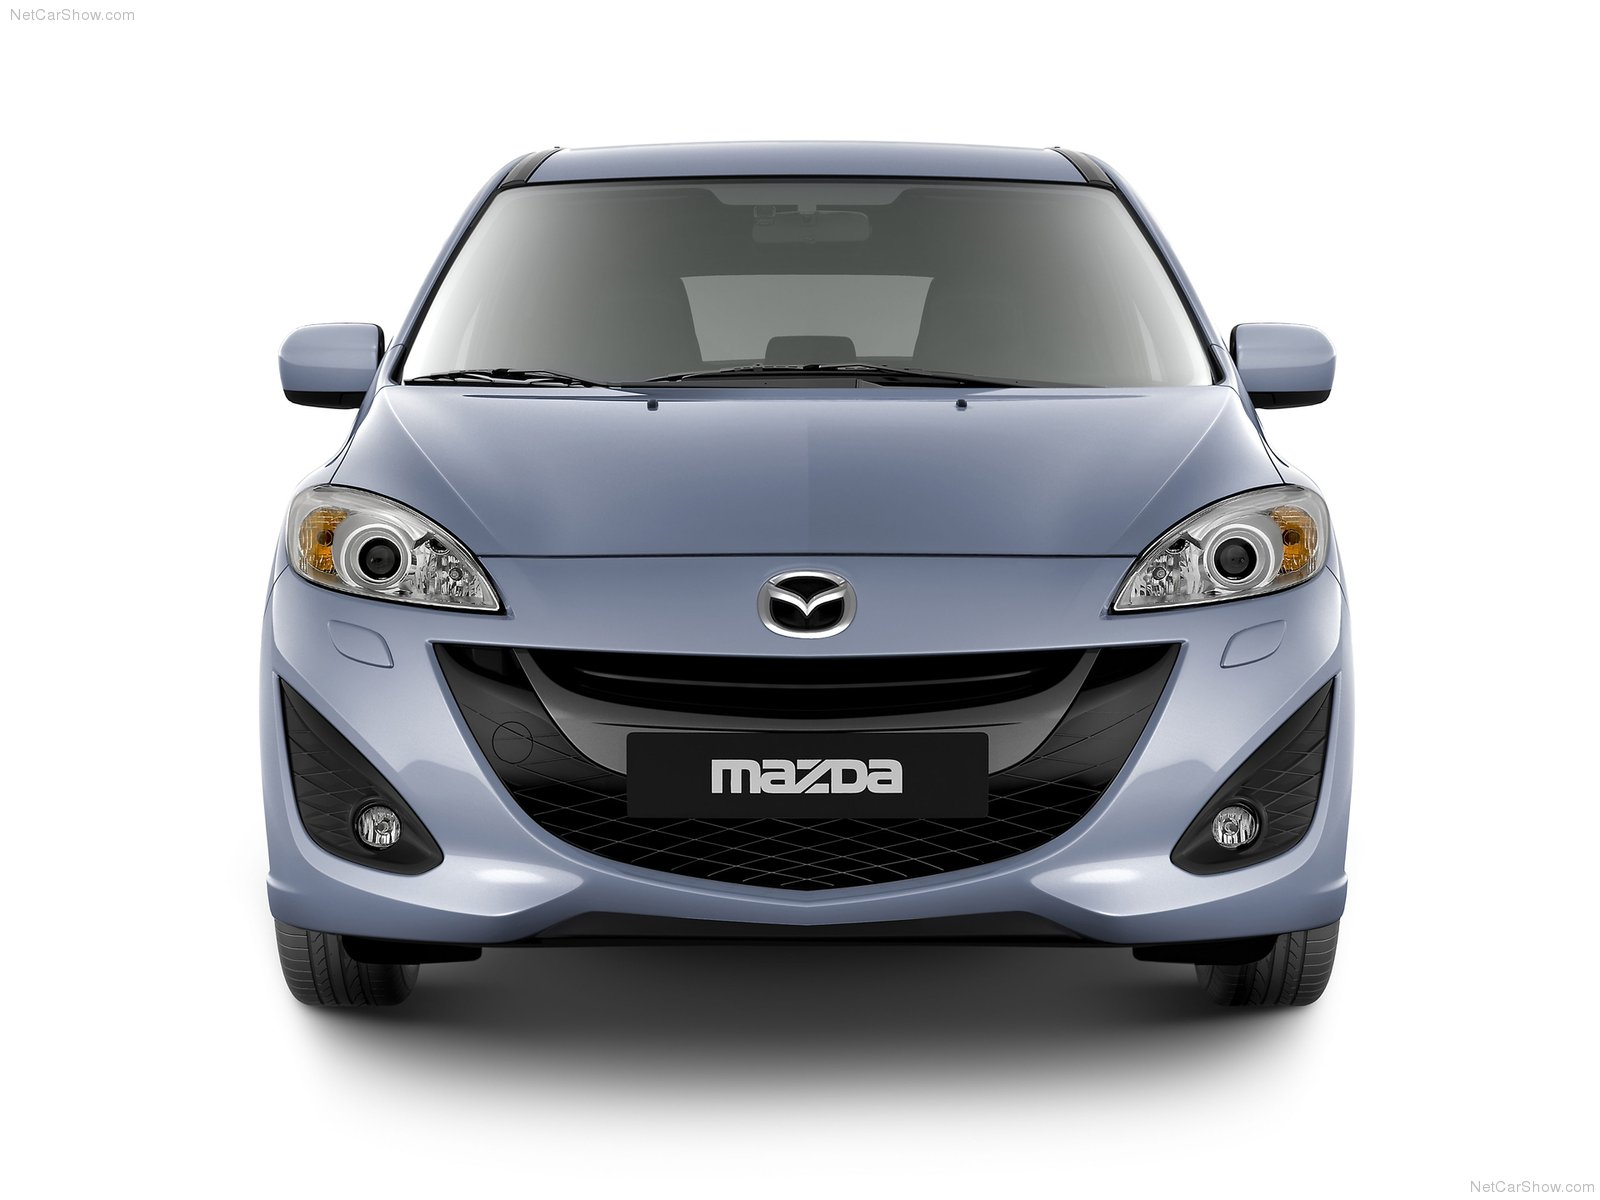 http://1.bp.blogspot.com/_D5hgPjGJZ54/TDePVICvbfI/AAAAAAAADcA/ILcA4-CPxVM/s1600/Mazda-5_2011_1600x1200_wallpaper_1c.jpg